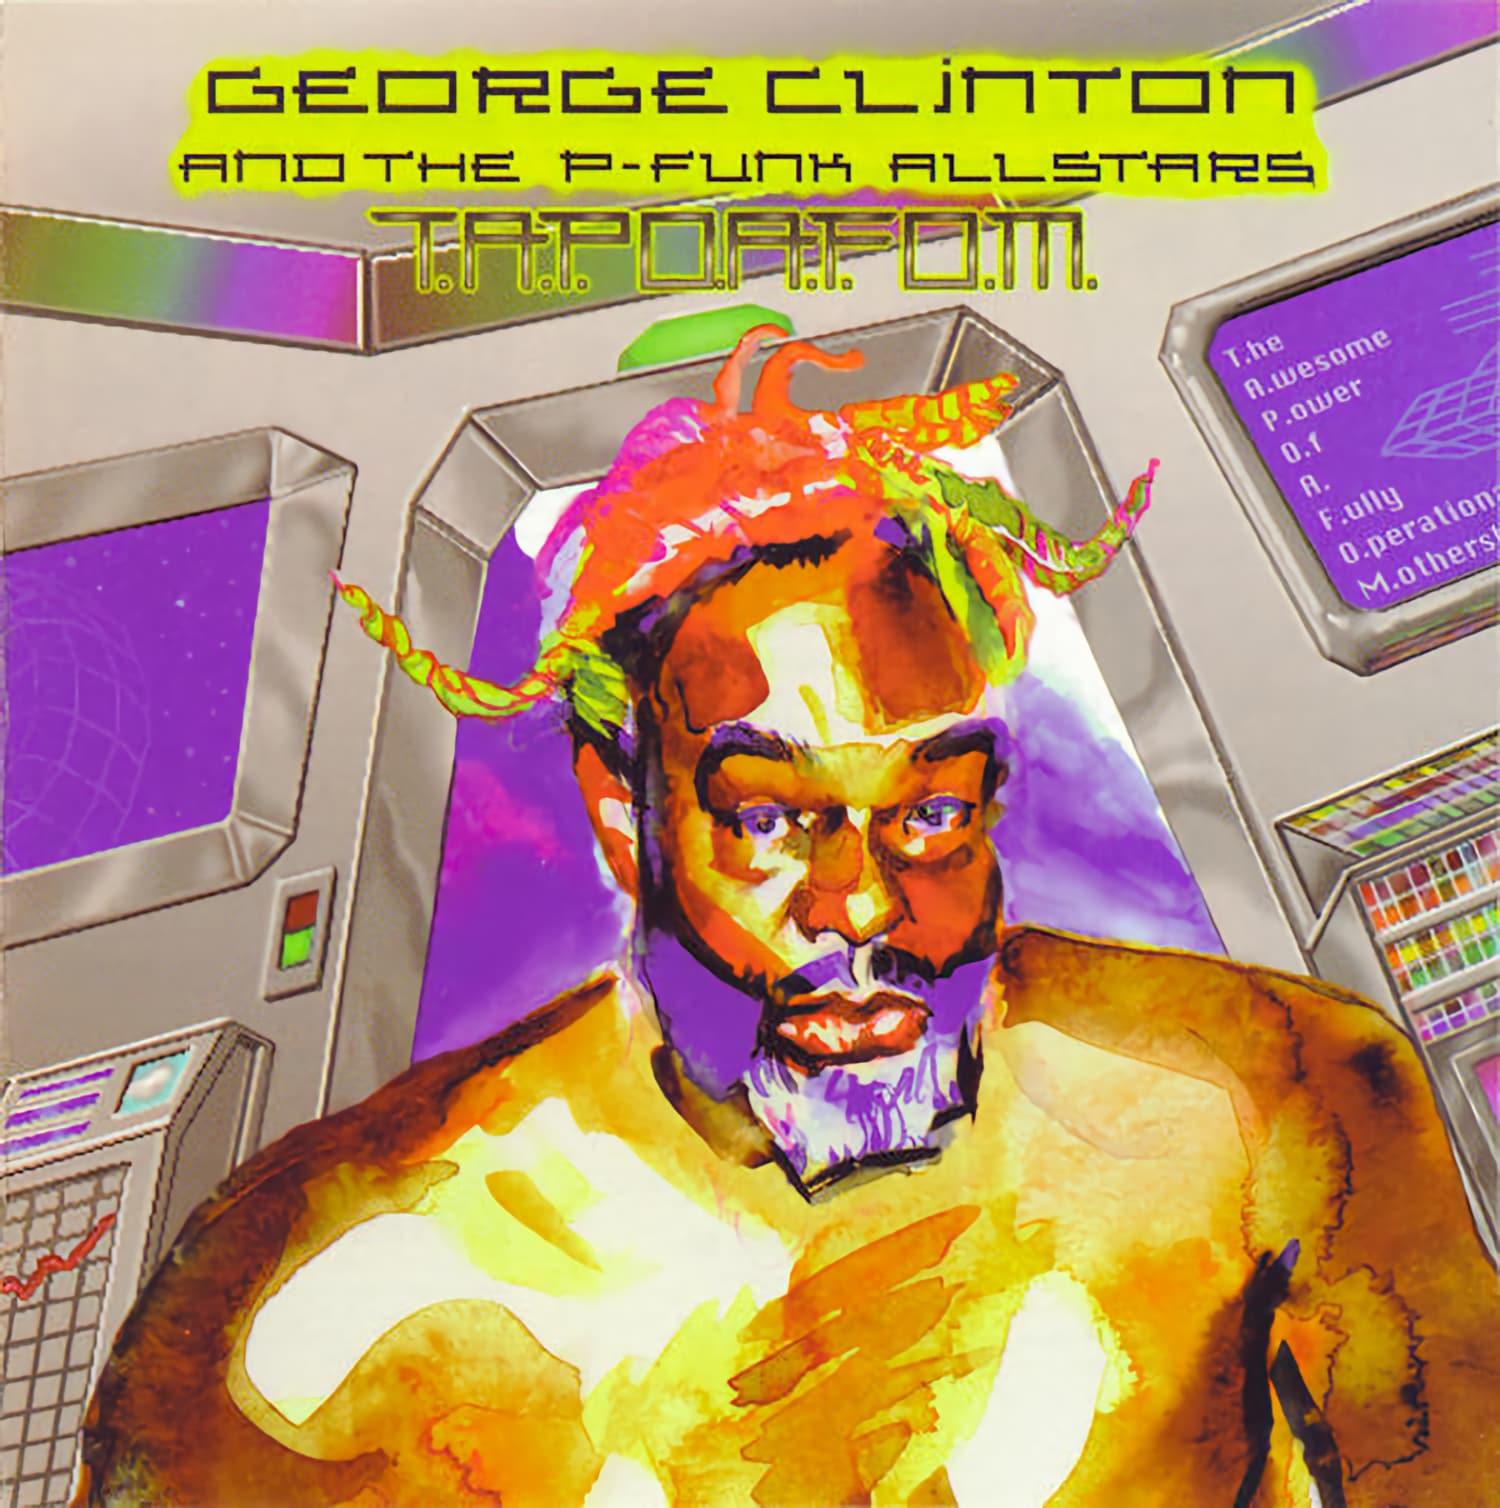 George Clinton & The P-Funk All Stars - T.A.P.O.A.F.O.M.